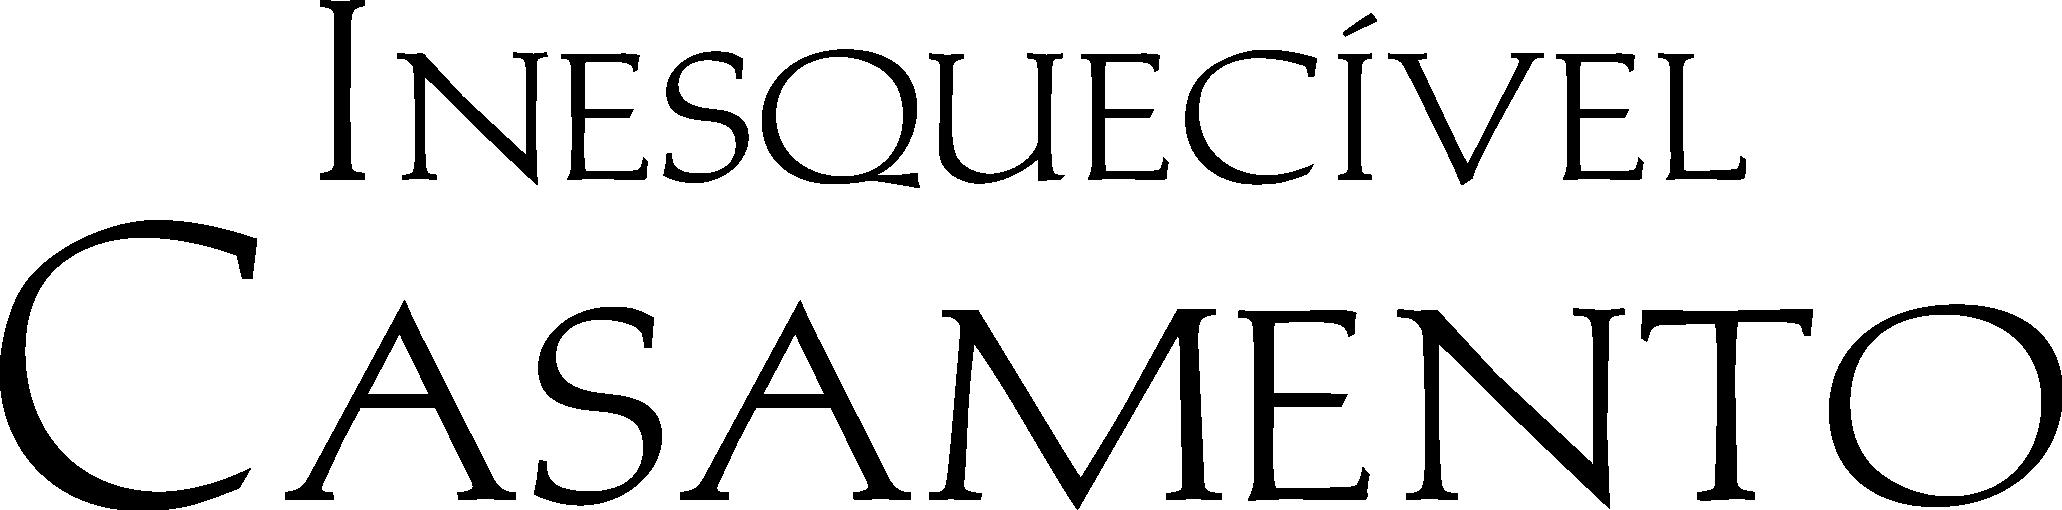 %24x3g4htzilakhaodh